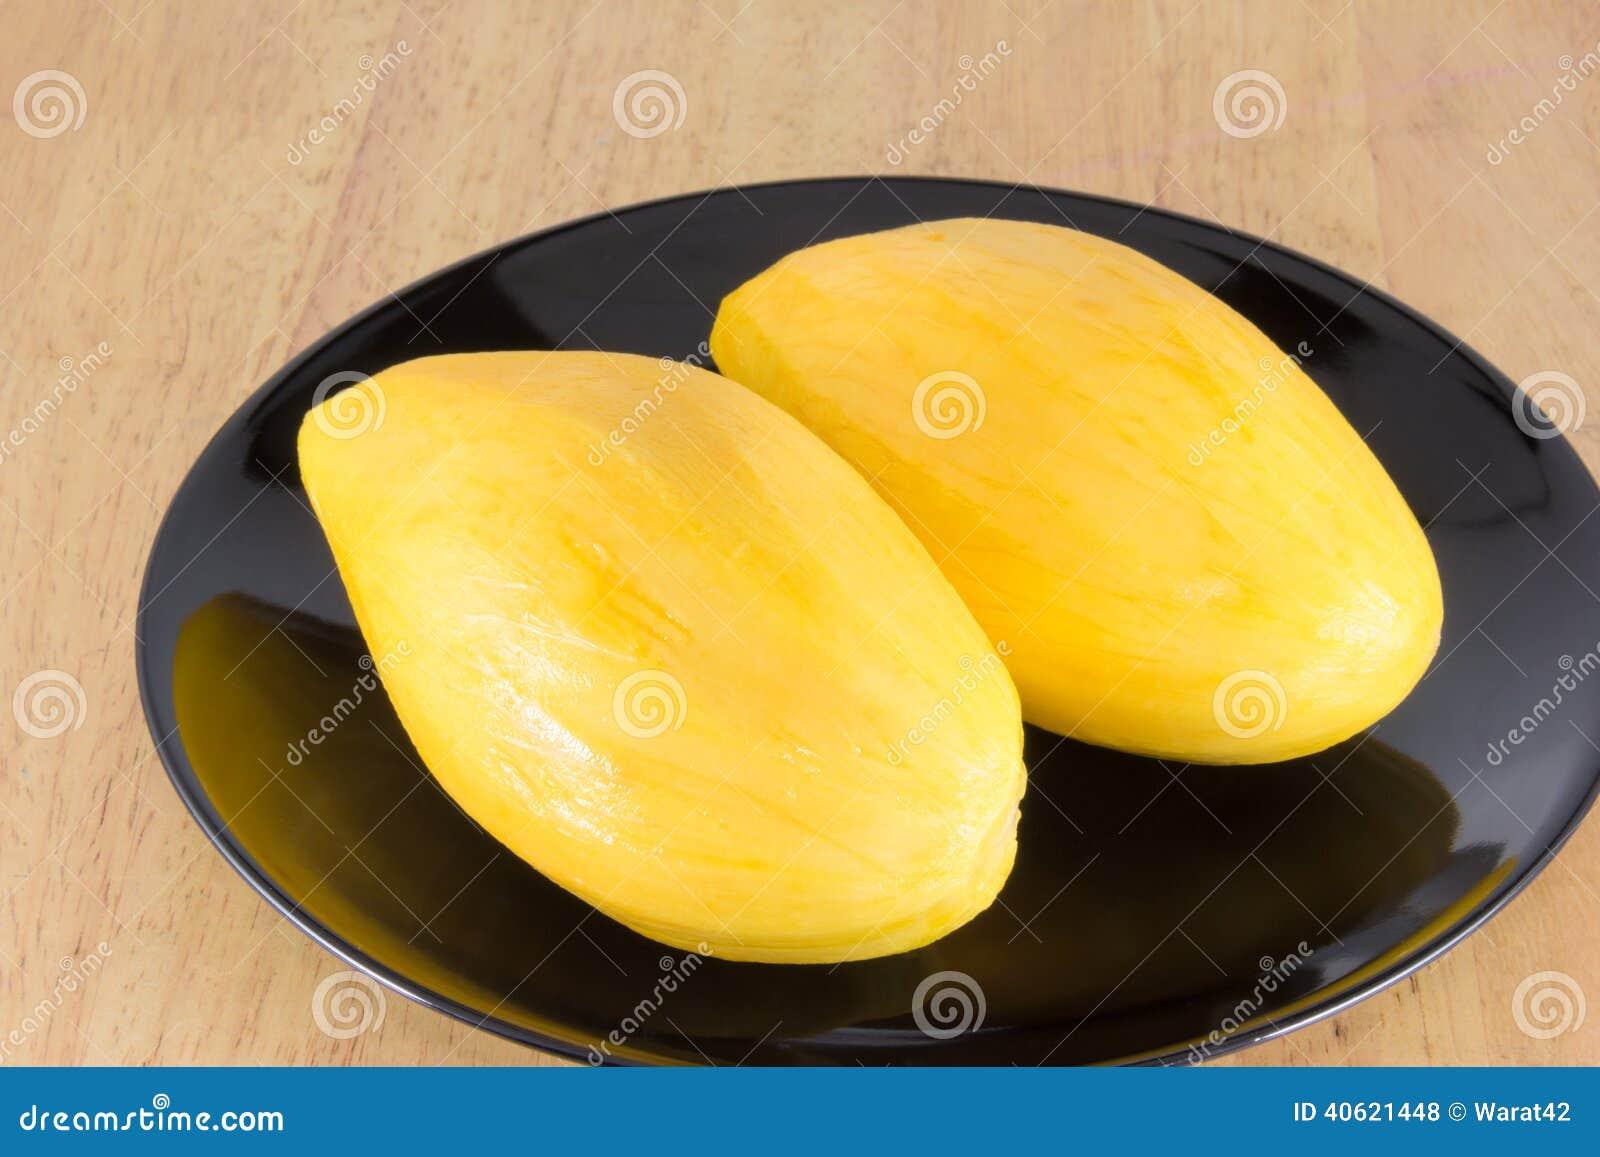 Ripe Mango Ready To Eat Stock Photo